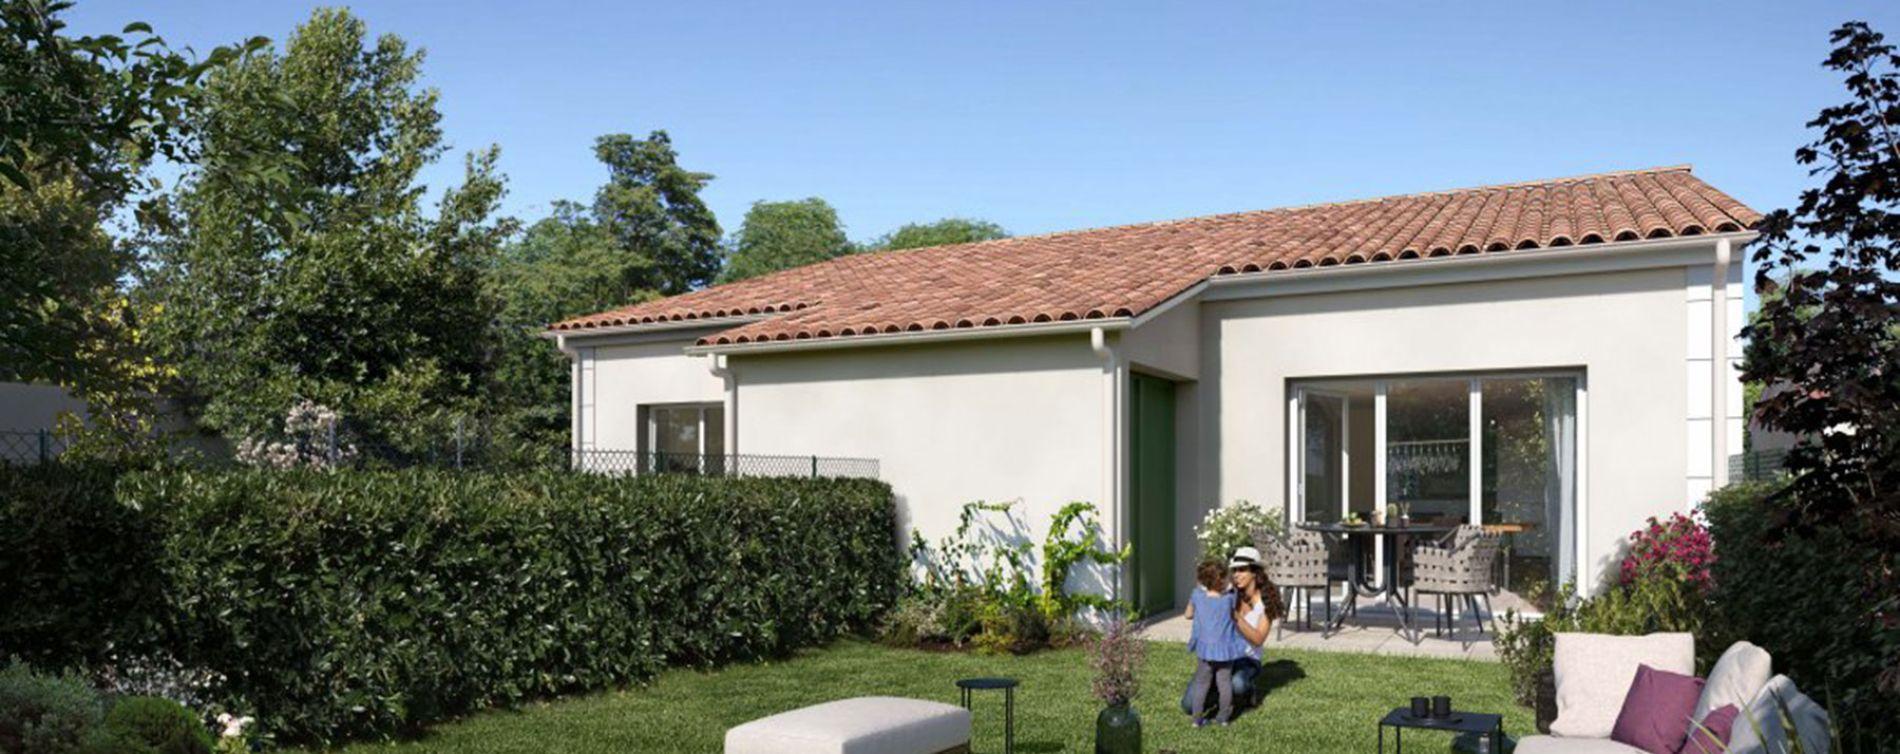 Pertuis : programme immobilier neuve « Luberance » (4)